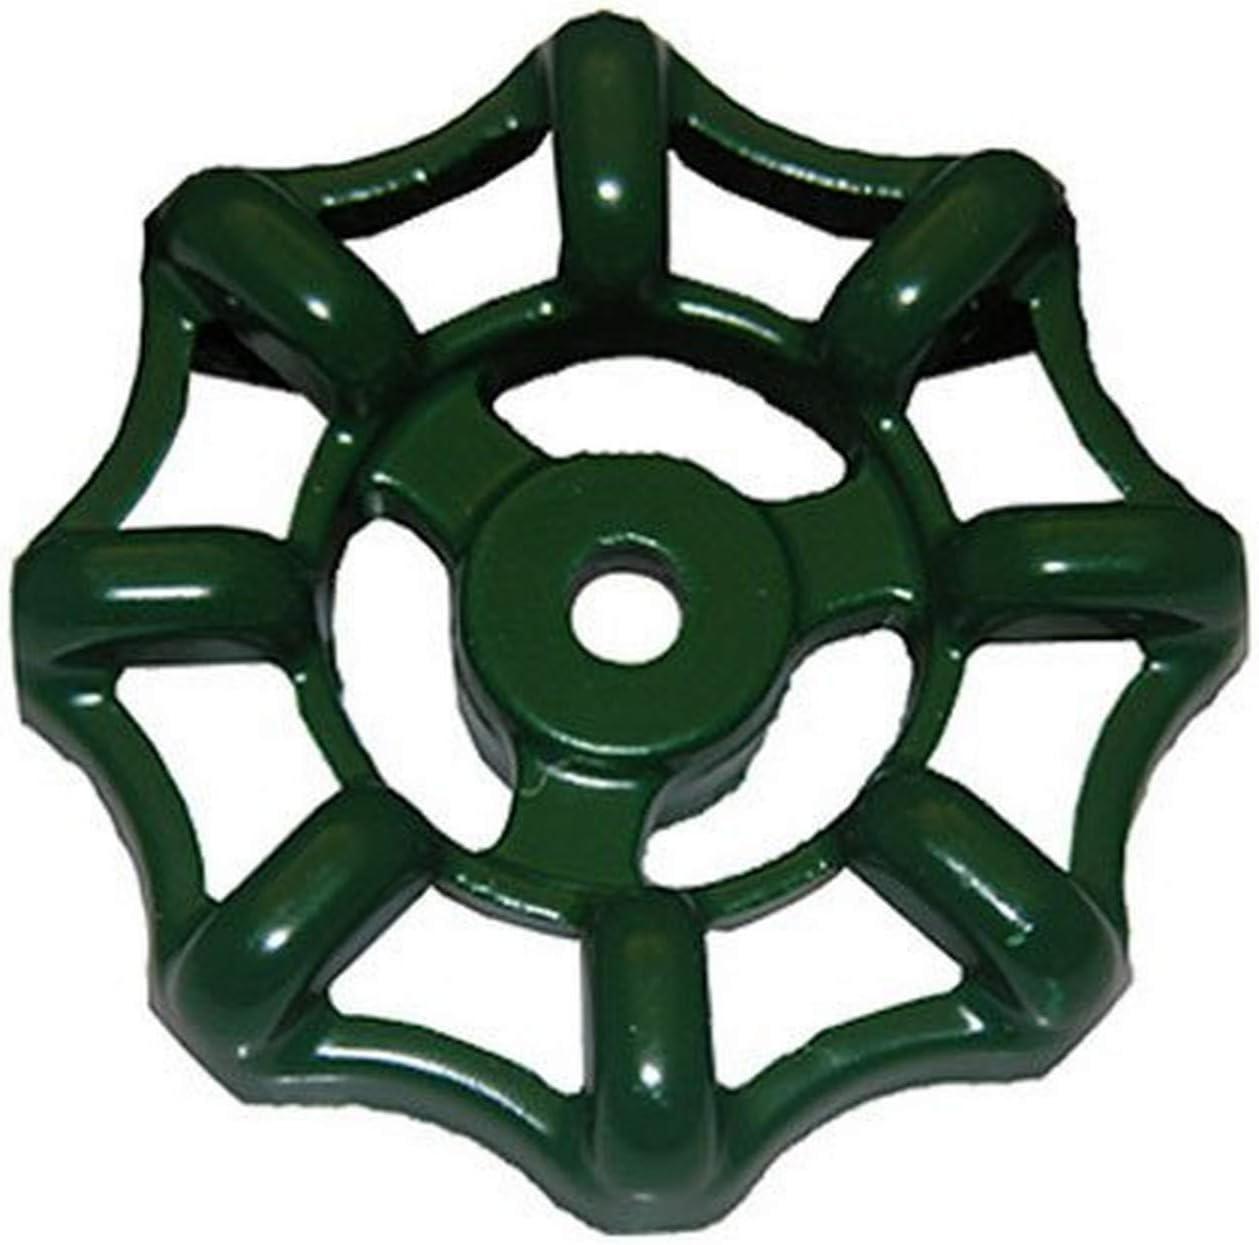 12 Point Broach LASCO 01-5109 Metal Outside Faucet Hose Bibb Round Wheel Handle